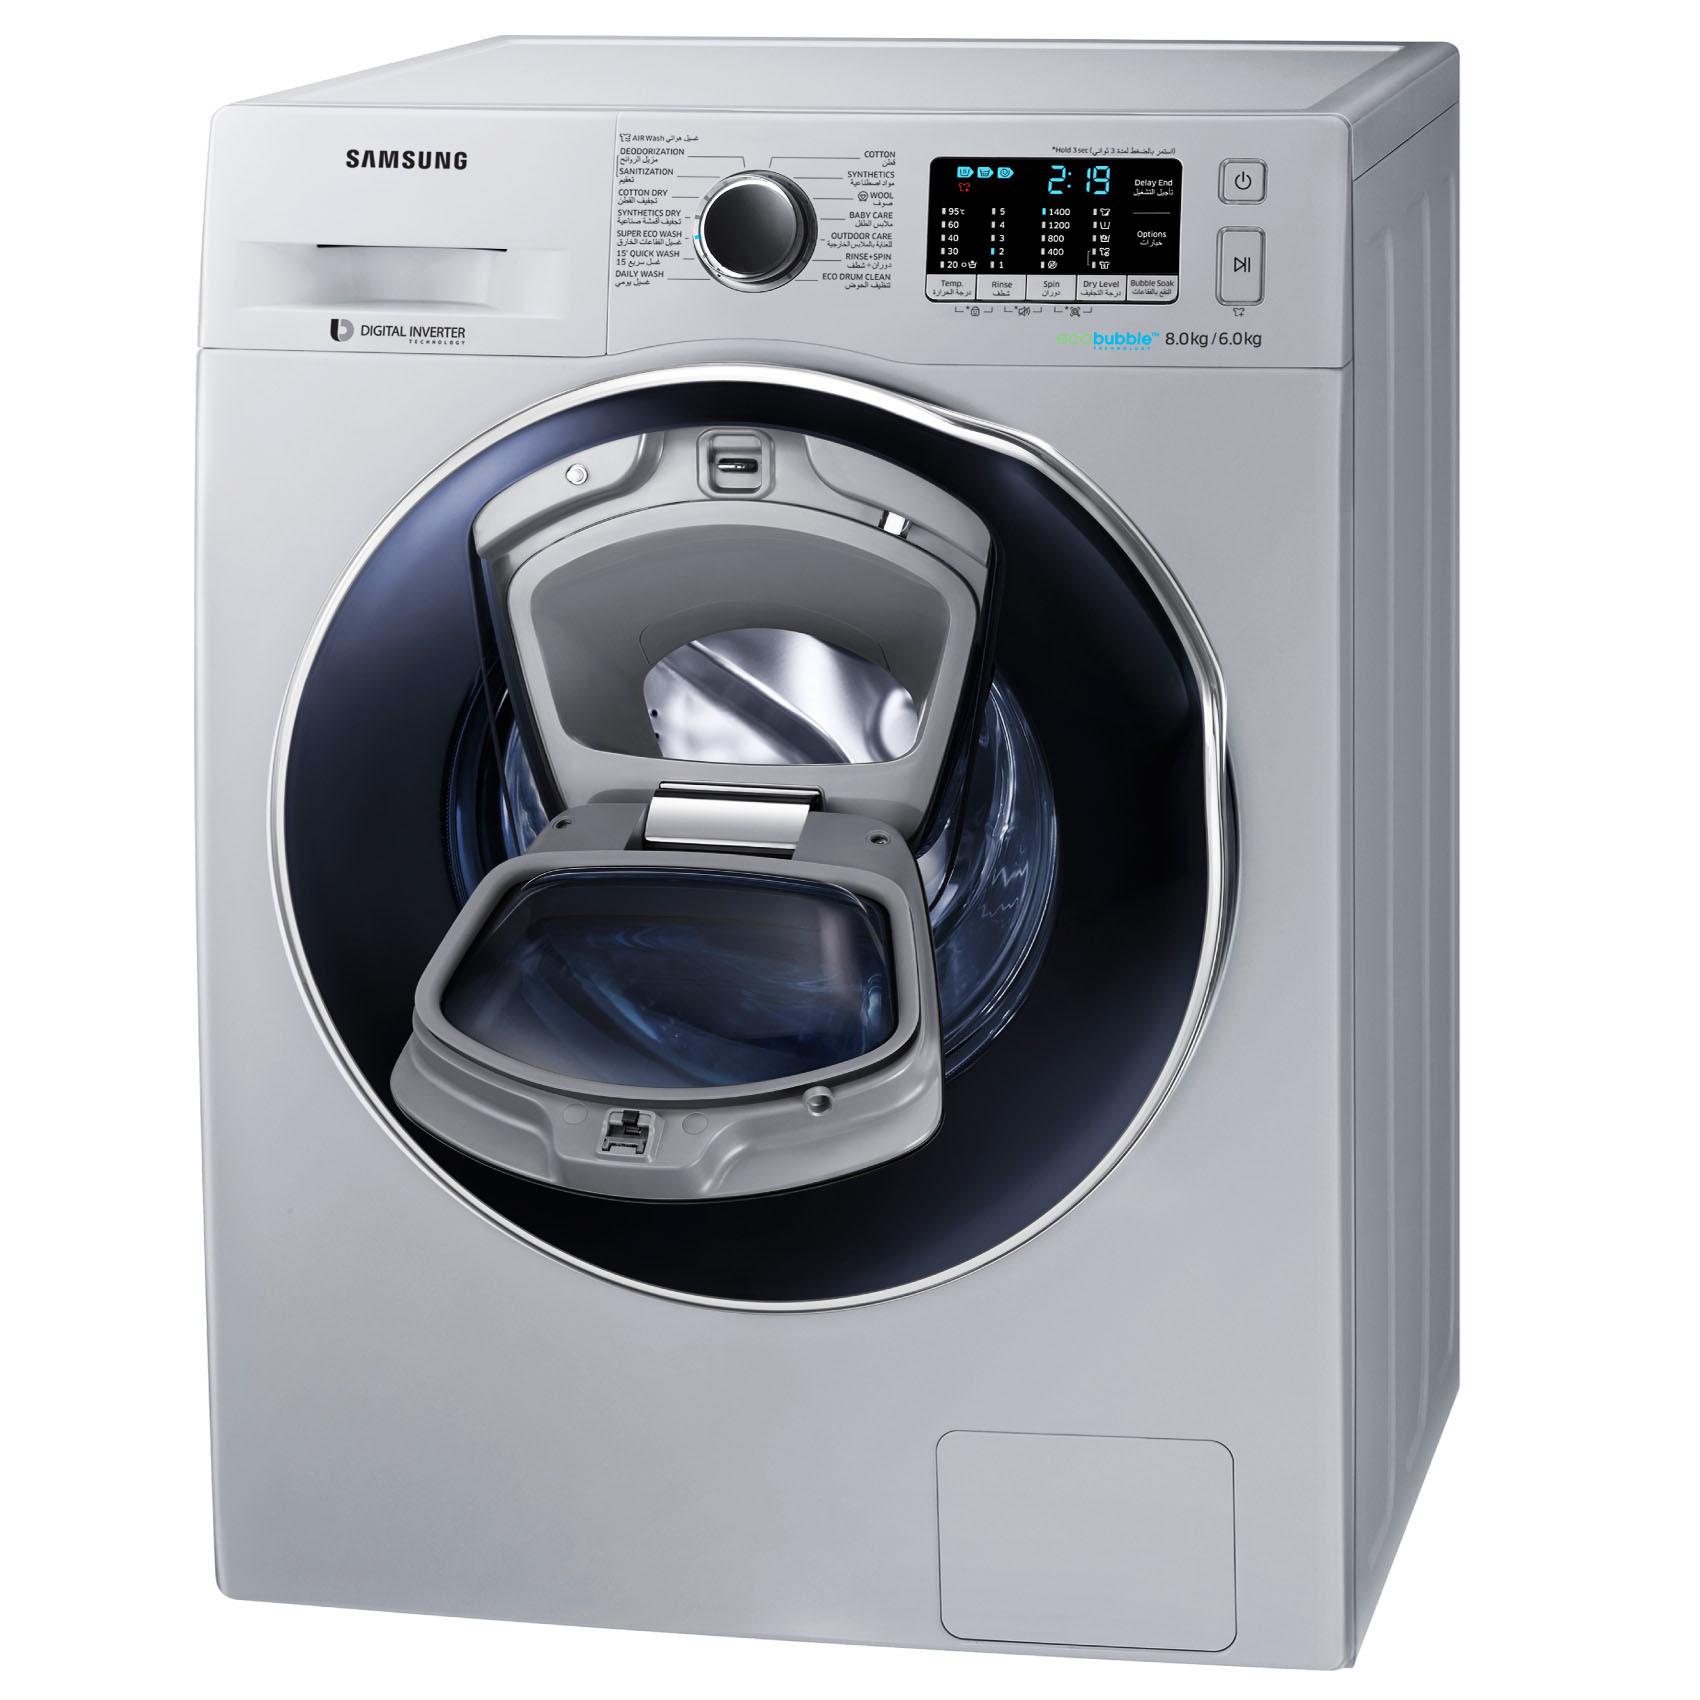 SAMSUNG W/DRYER WD80K5410OS 8/6KG